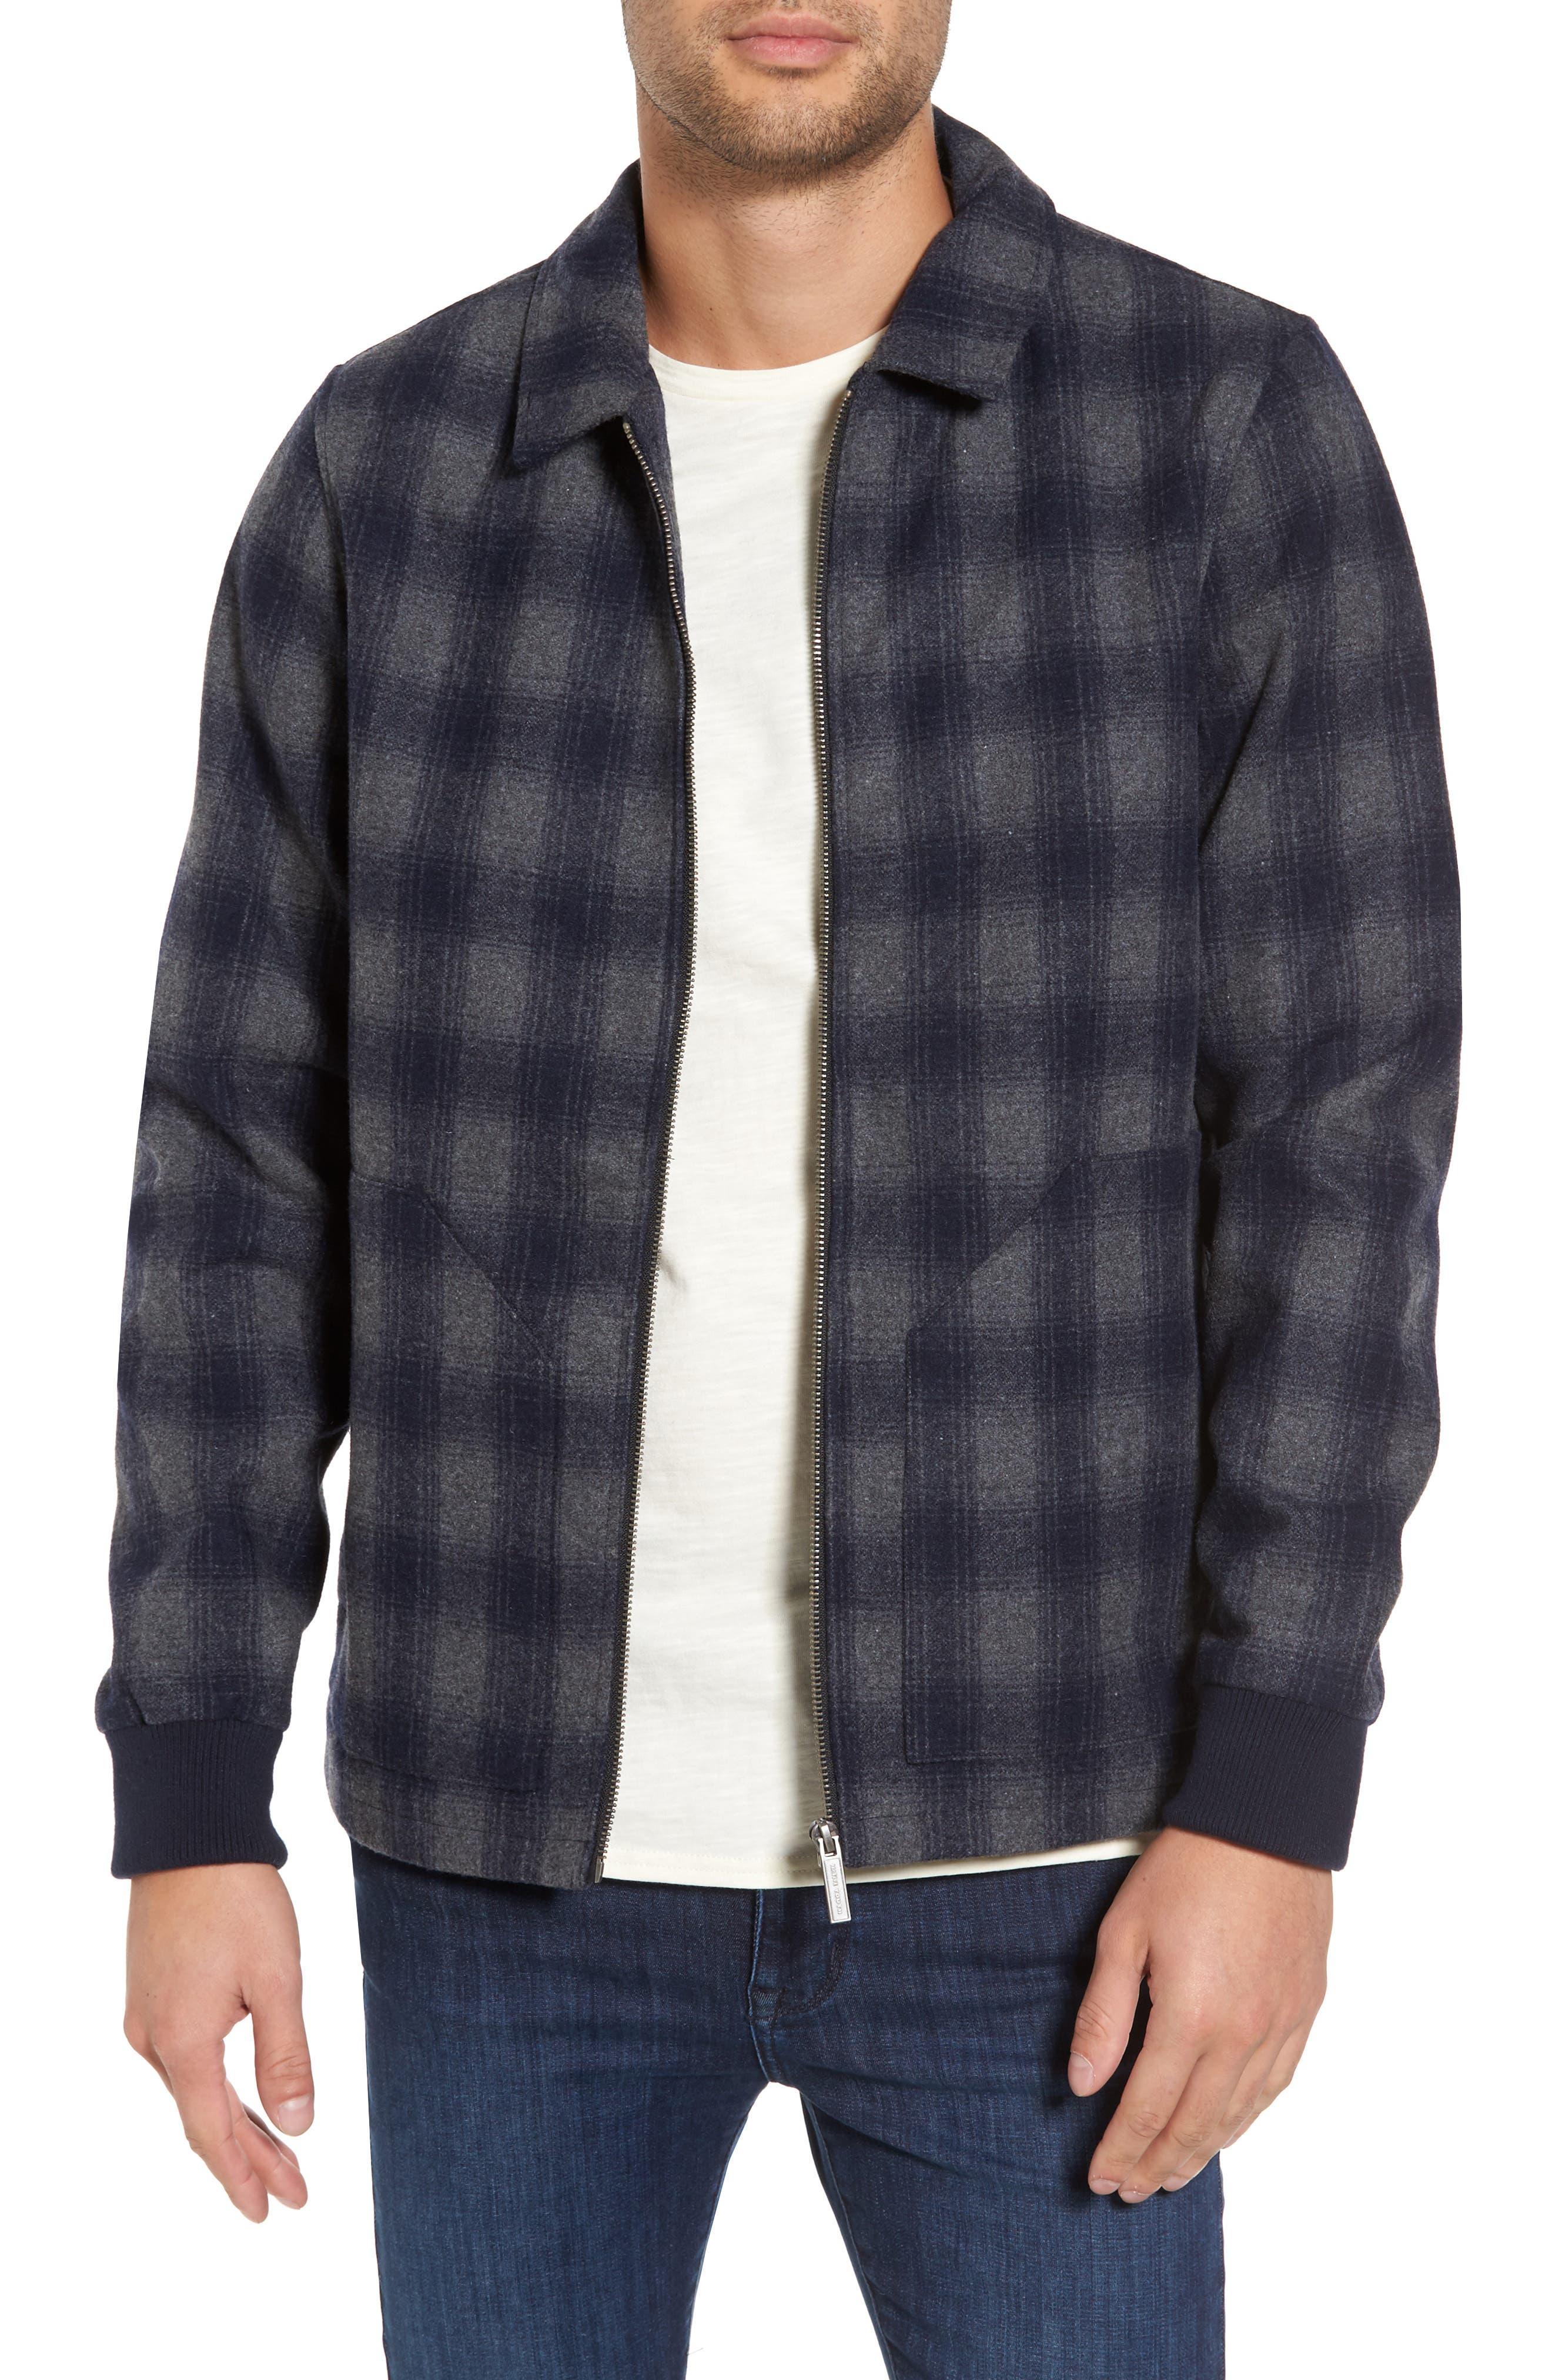 Robinsville Coach's Jacket,                         Main,                         color, Grey Check